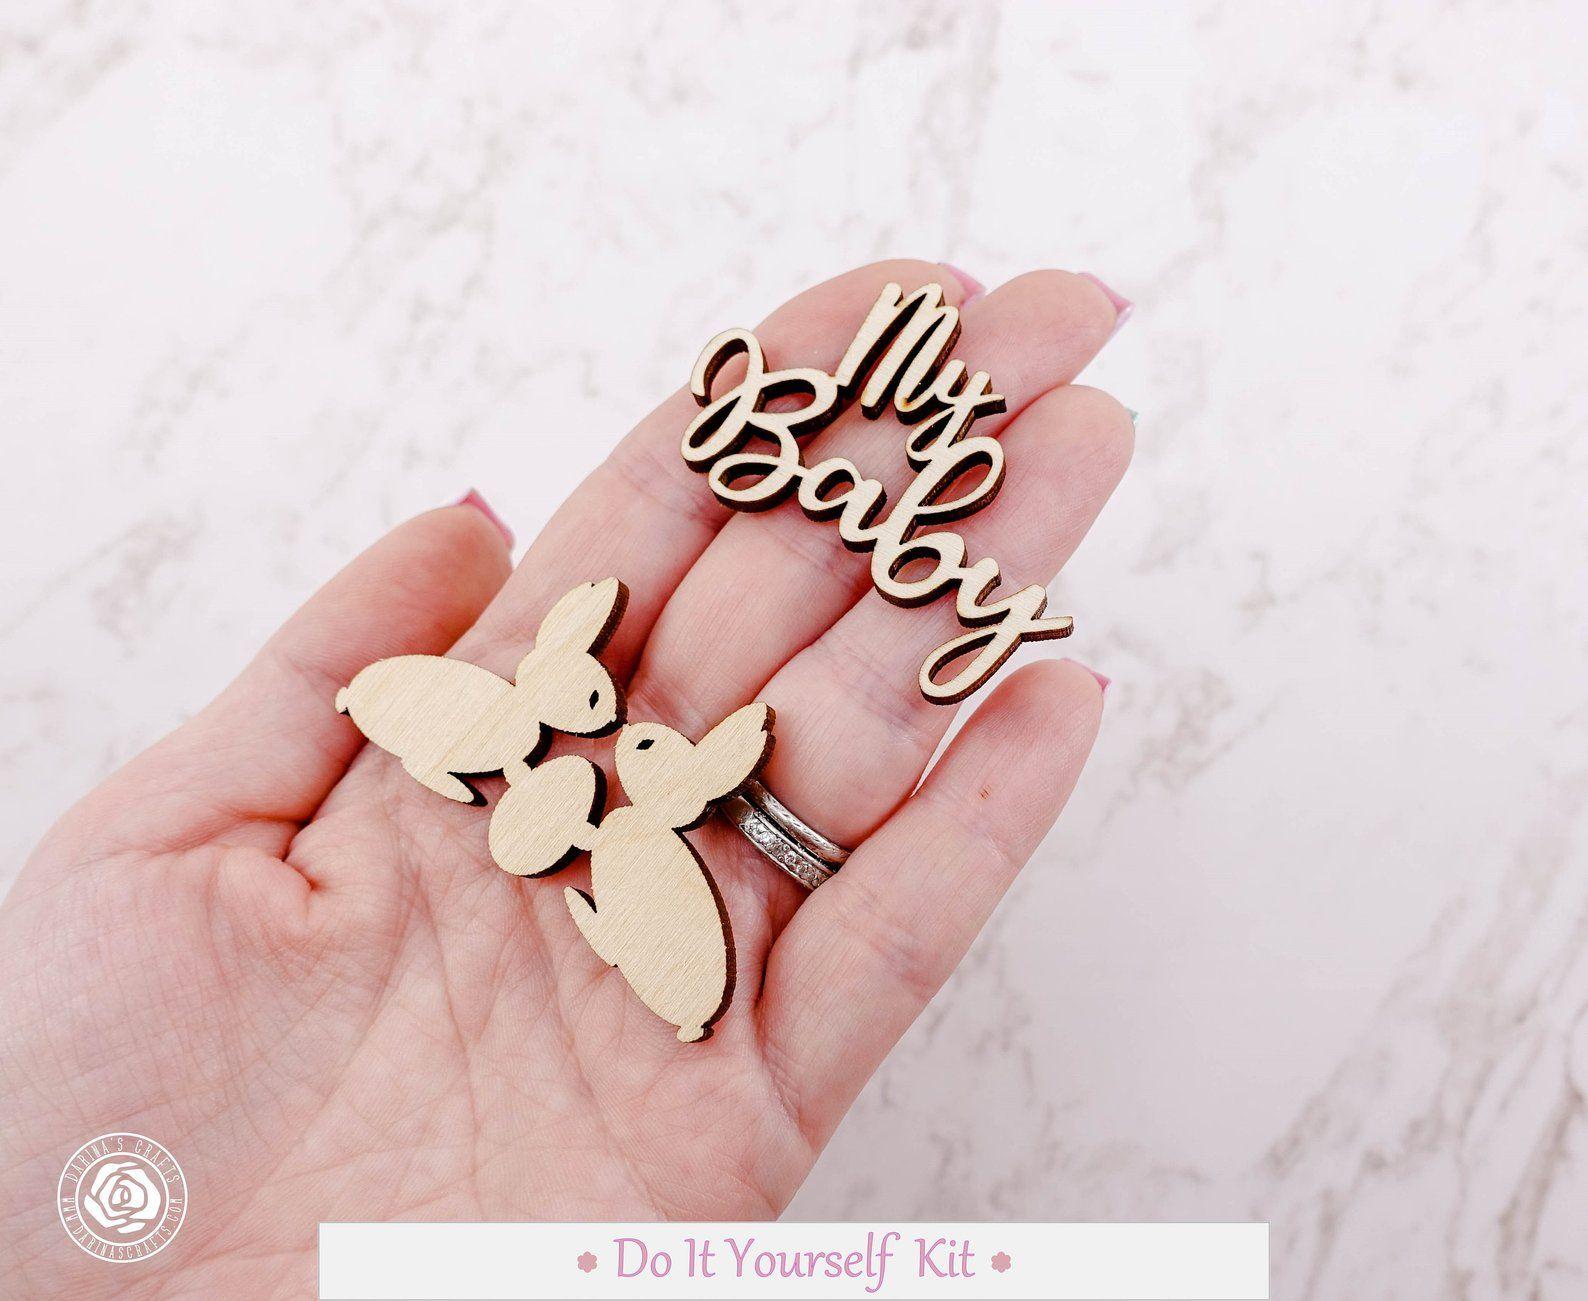 Personalized Baby Boy Diy Scrapbook Kit Boy Themed Scrapbooking